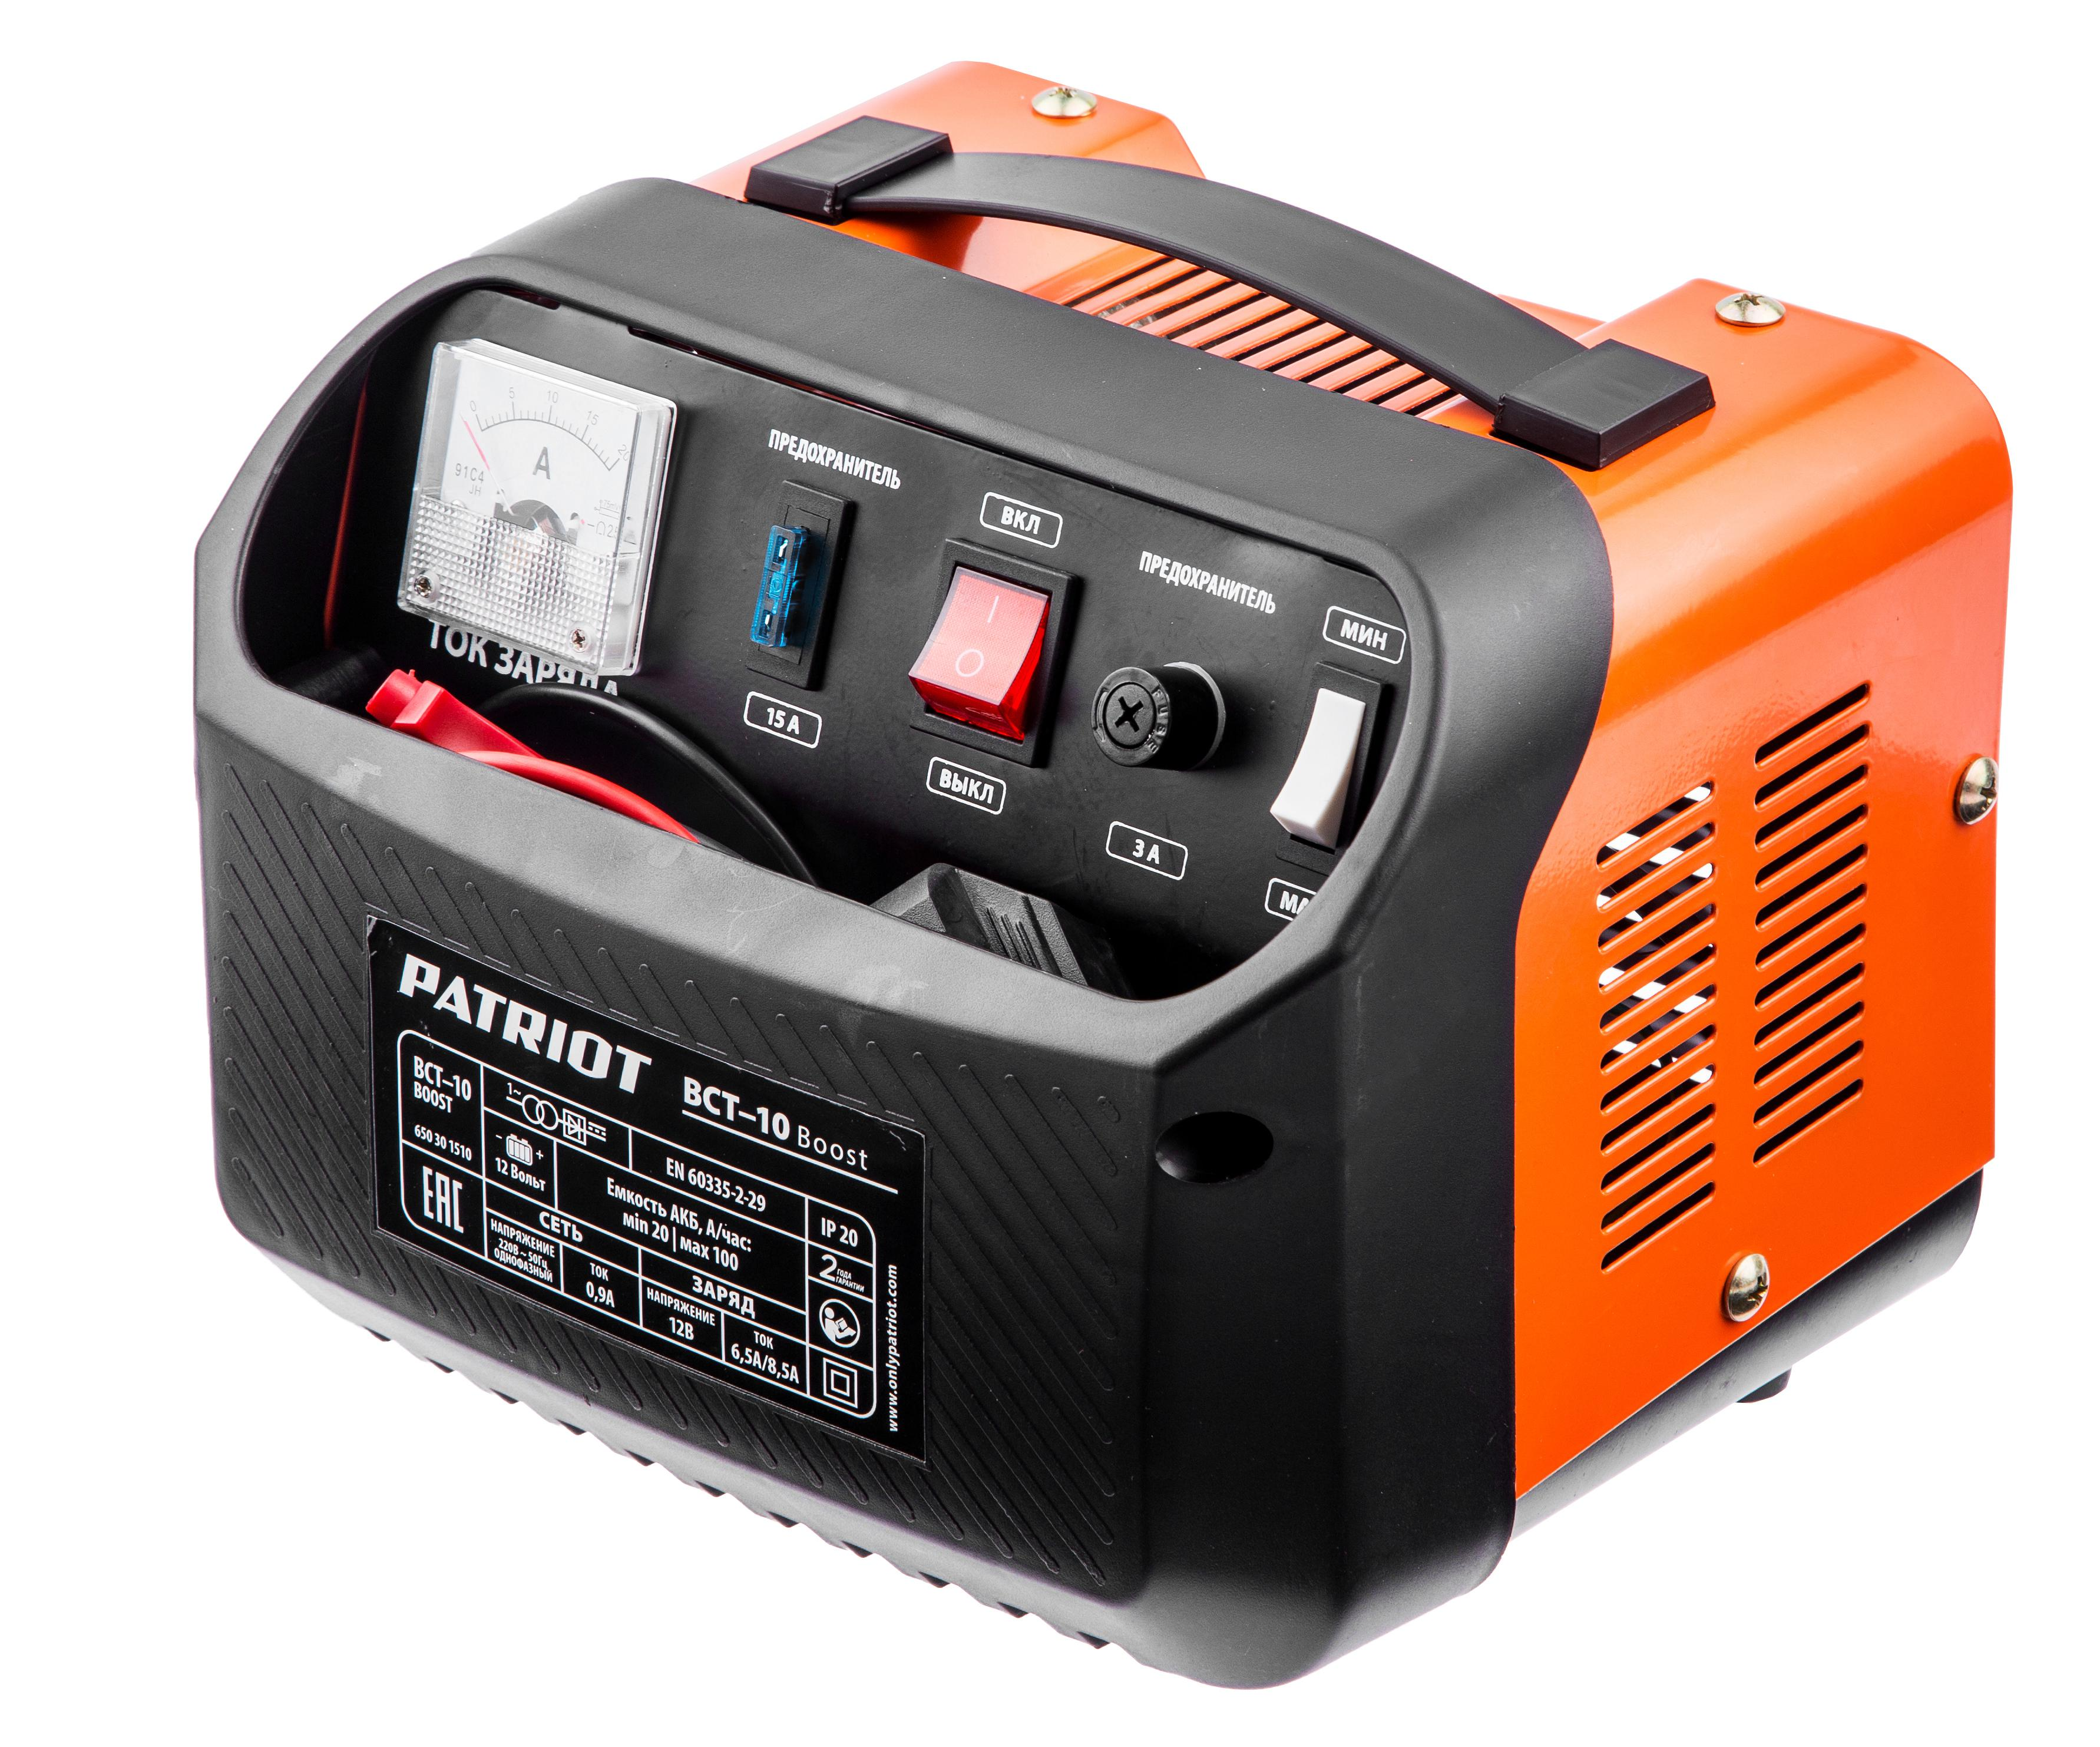 Устройство пуско-зарядное Patriot Bct-10 boost пуско зарядное устройство с компрессором каркам пзу 10